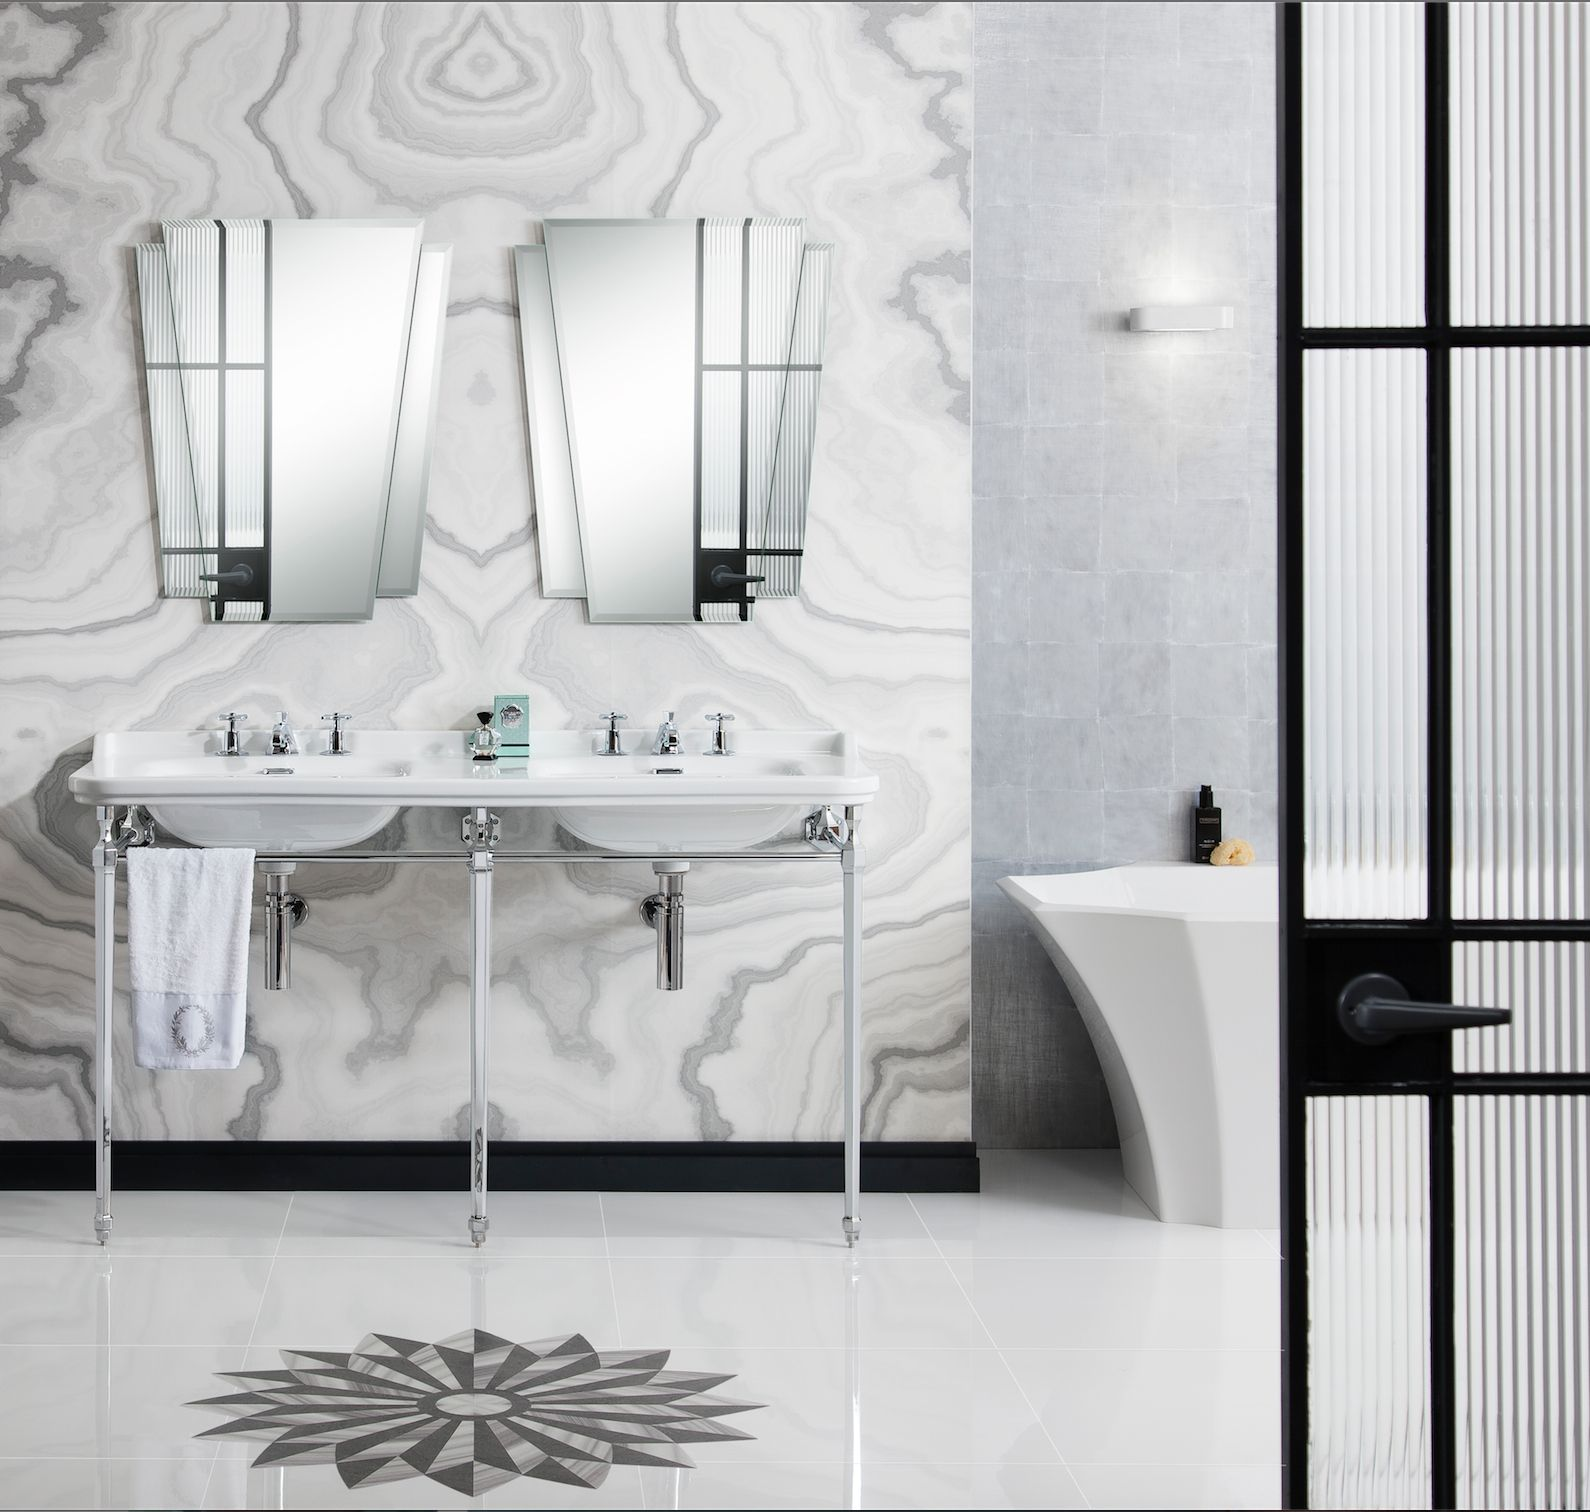 Belmont Hardware – CROSSWATER THE ULTIMATE BATHROOM DESIGN   Home ...